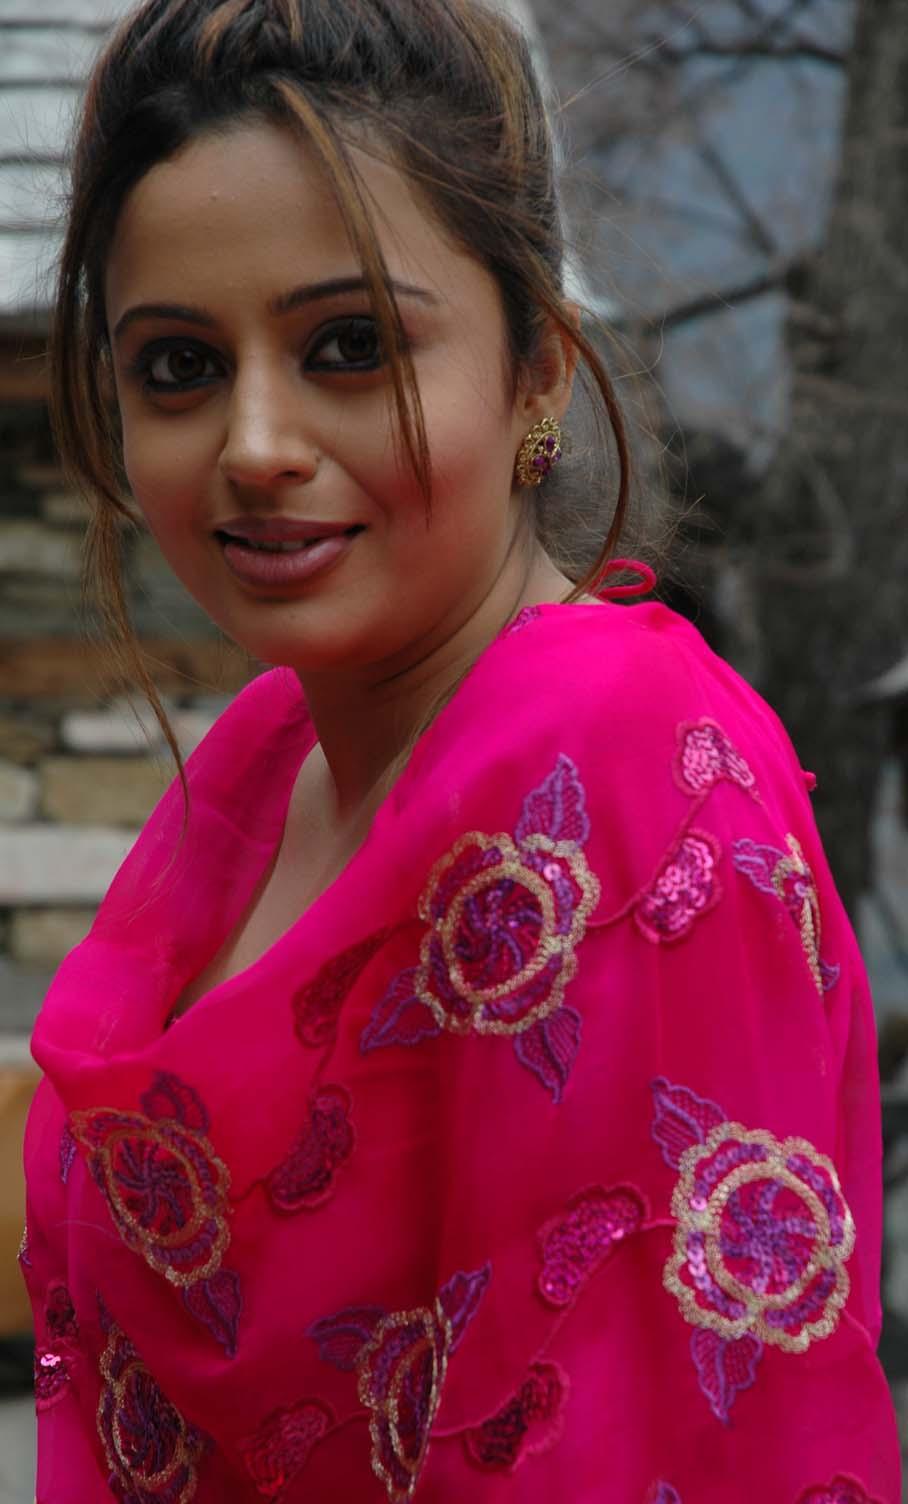 more wallpaper collections punjabi girls hot 711768 hd wallpaper backgrounds download punjabi girls hot